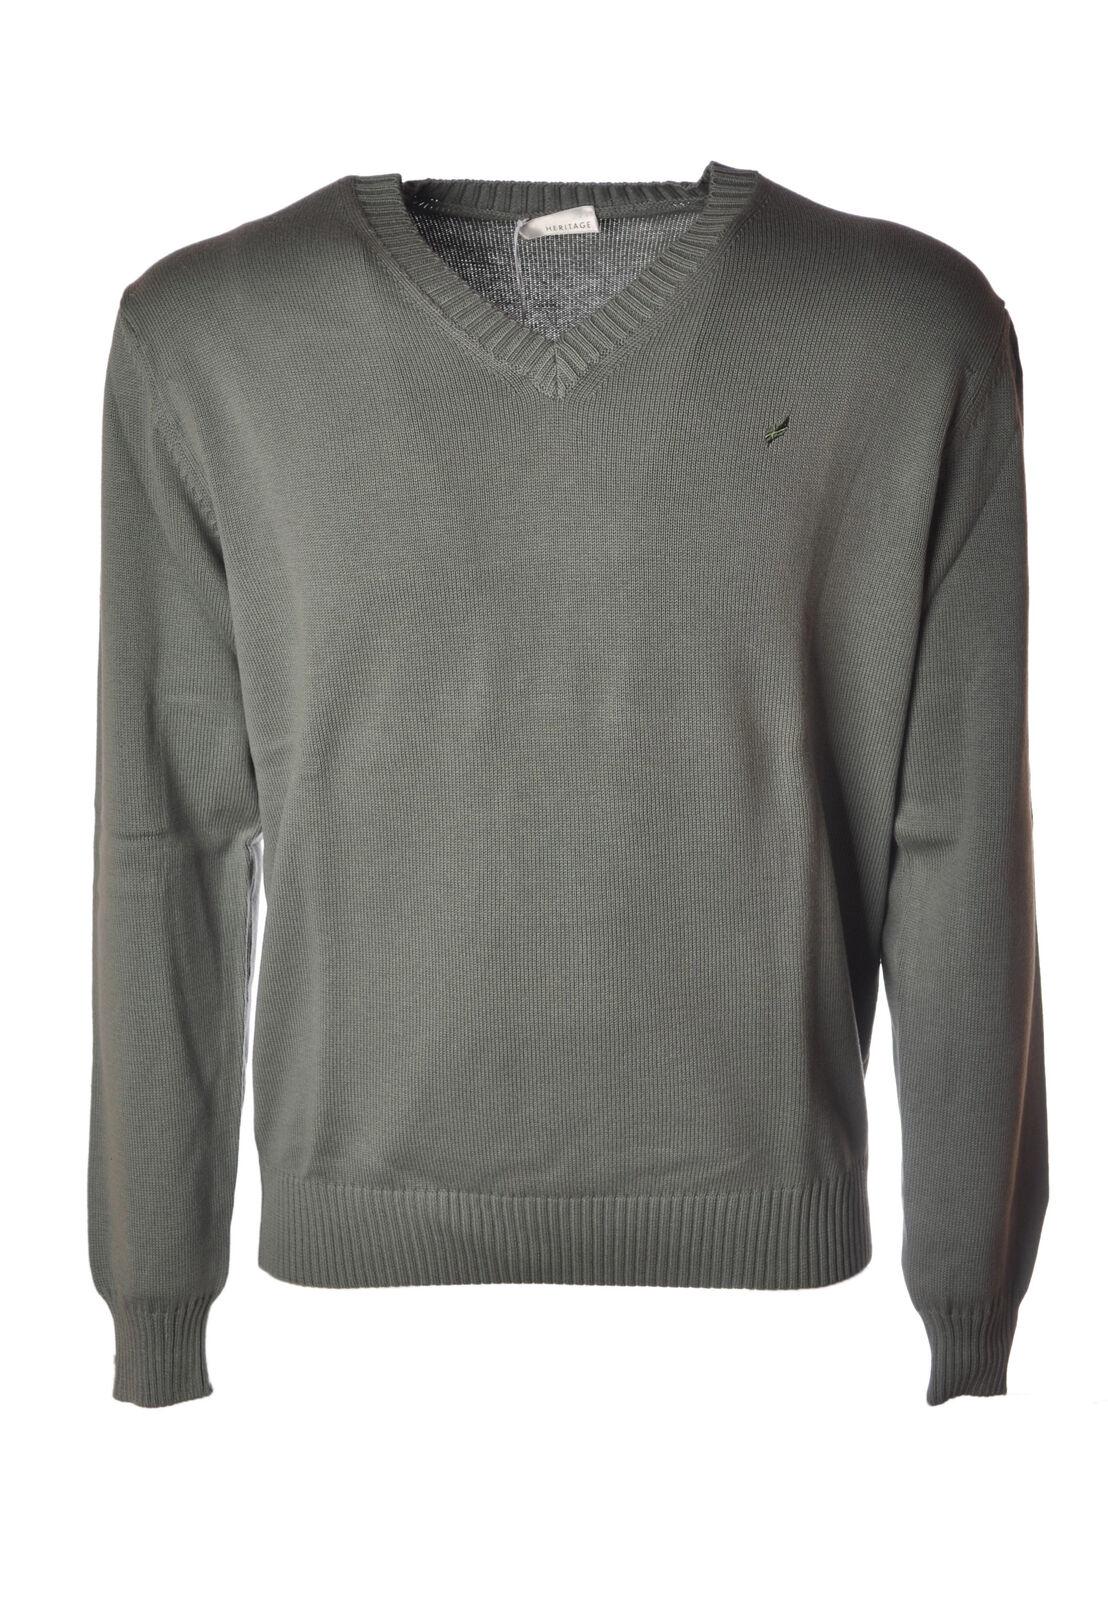 Heritage  -  Sweaters - Male - Grün - 4639122A185124